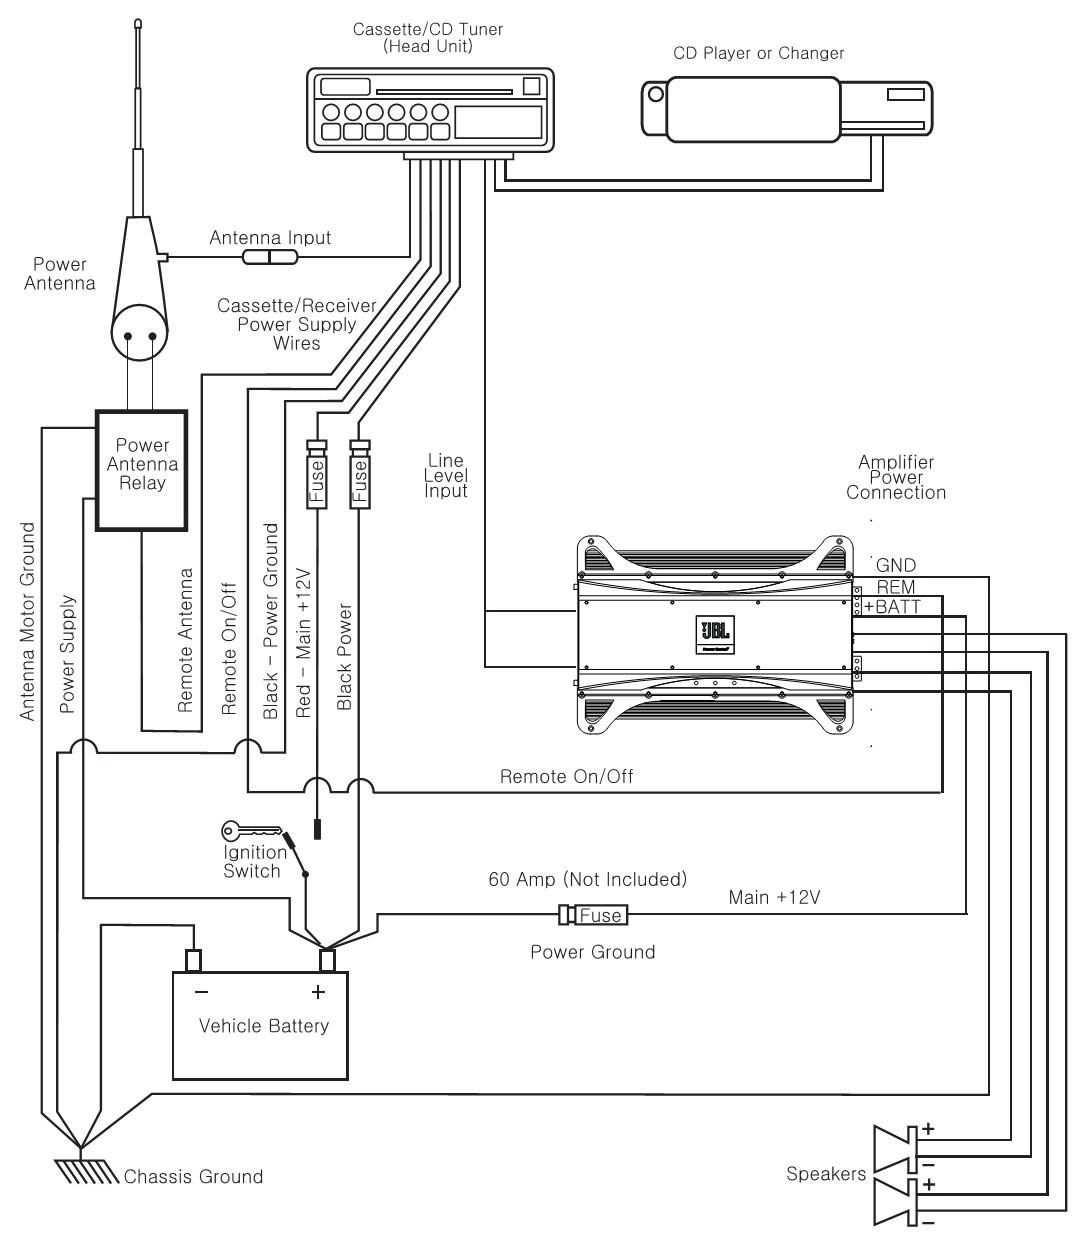 kenwood ddx7015 wiring diagram wiring diagram showkenwood ddx7015 wiring diagram wiring diagrams favorites kenwood ddx7015 wiring